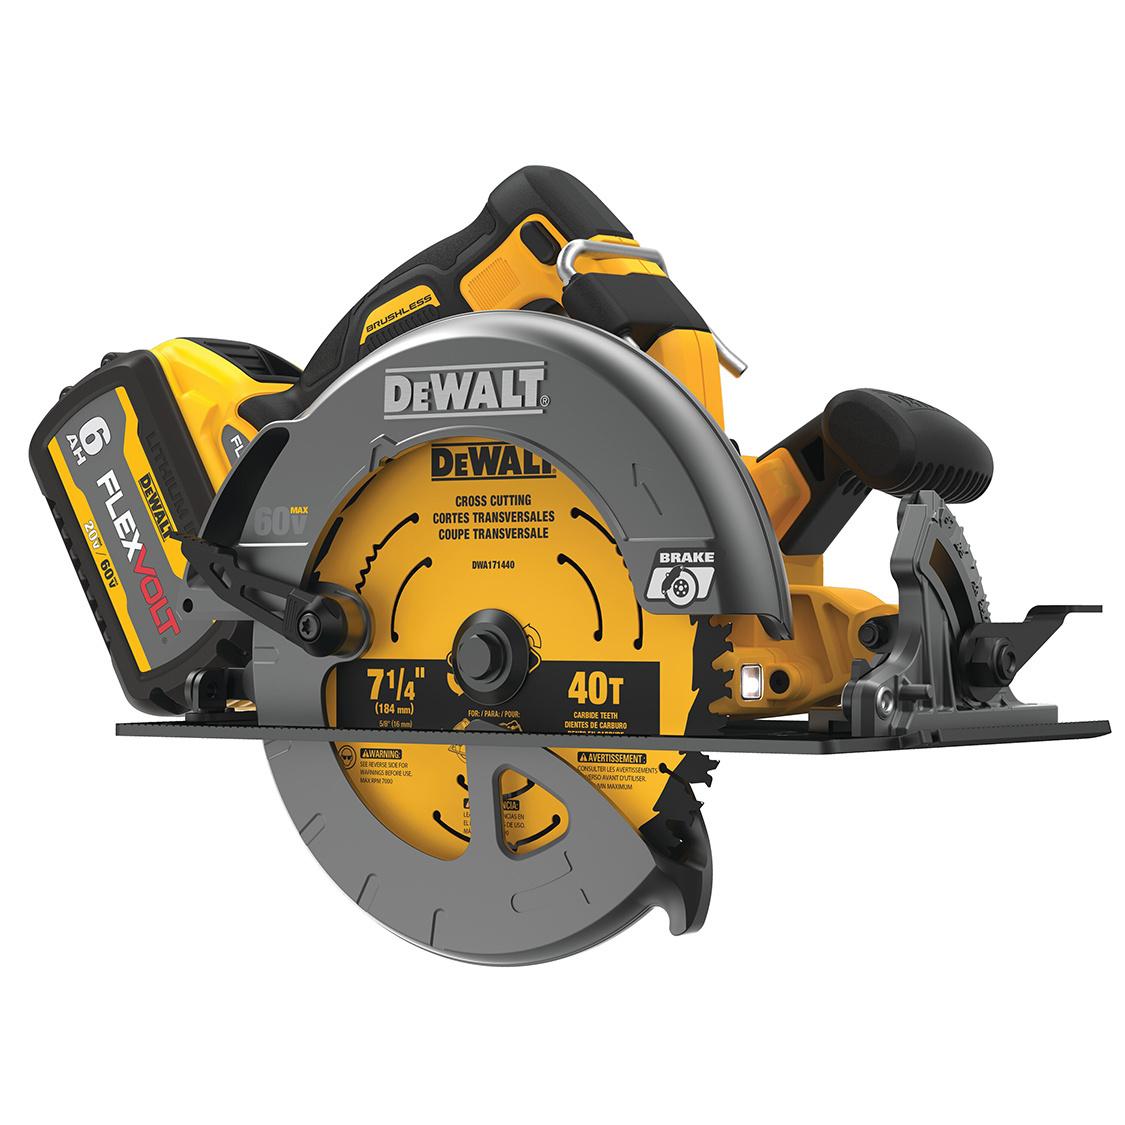 Dewalt-DCS575T1-CircularSaw-silo-oem.jpg